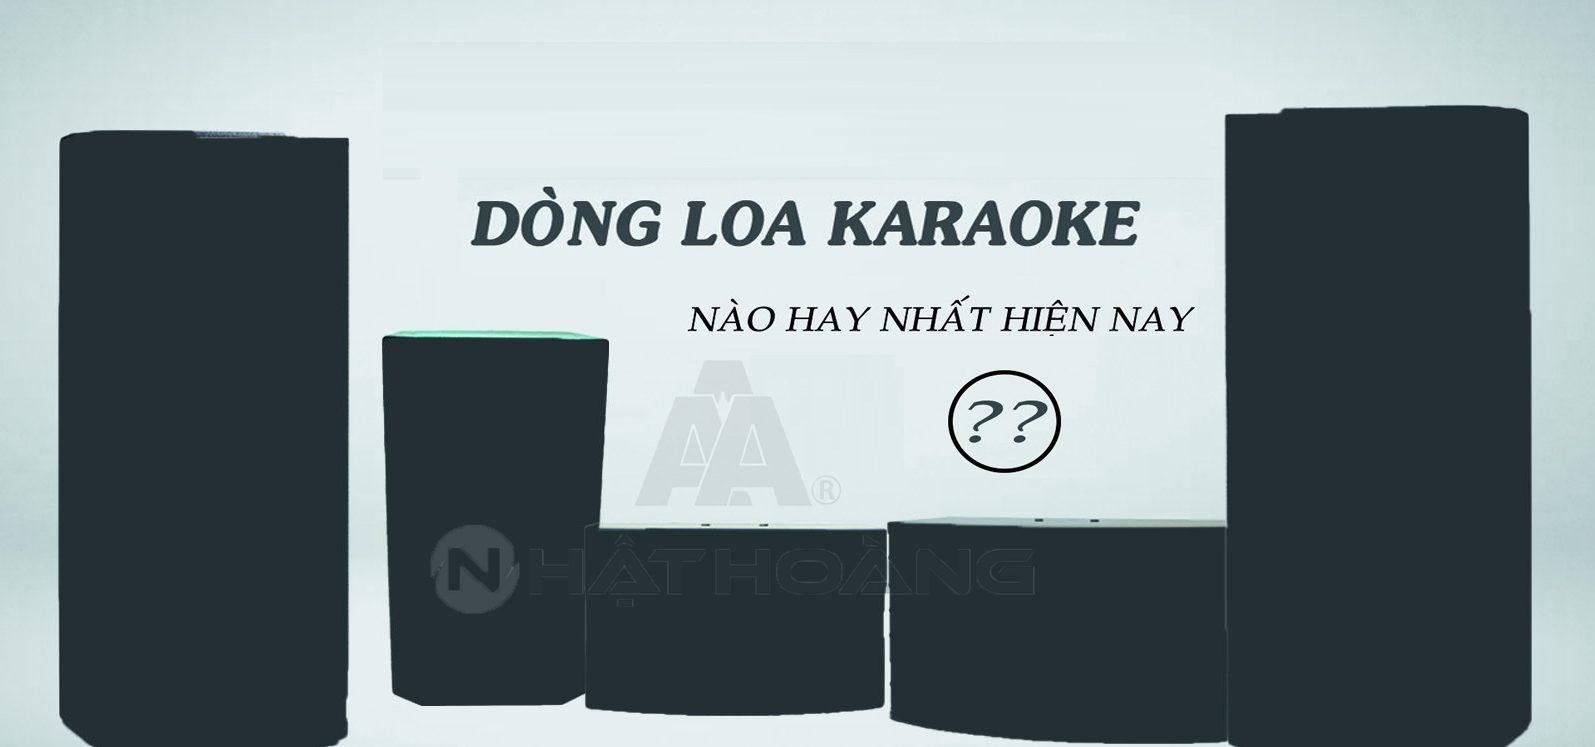 dong-loa-karaoke-hay-nhat-hien-nay